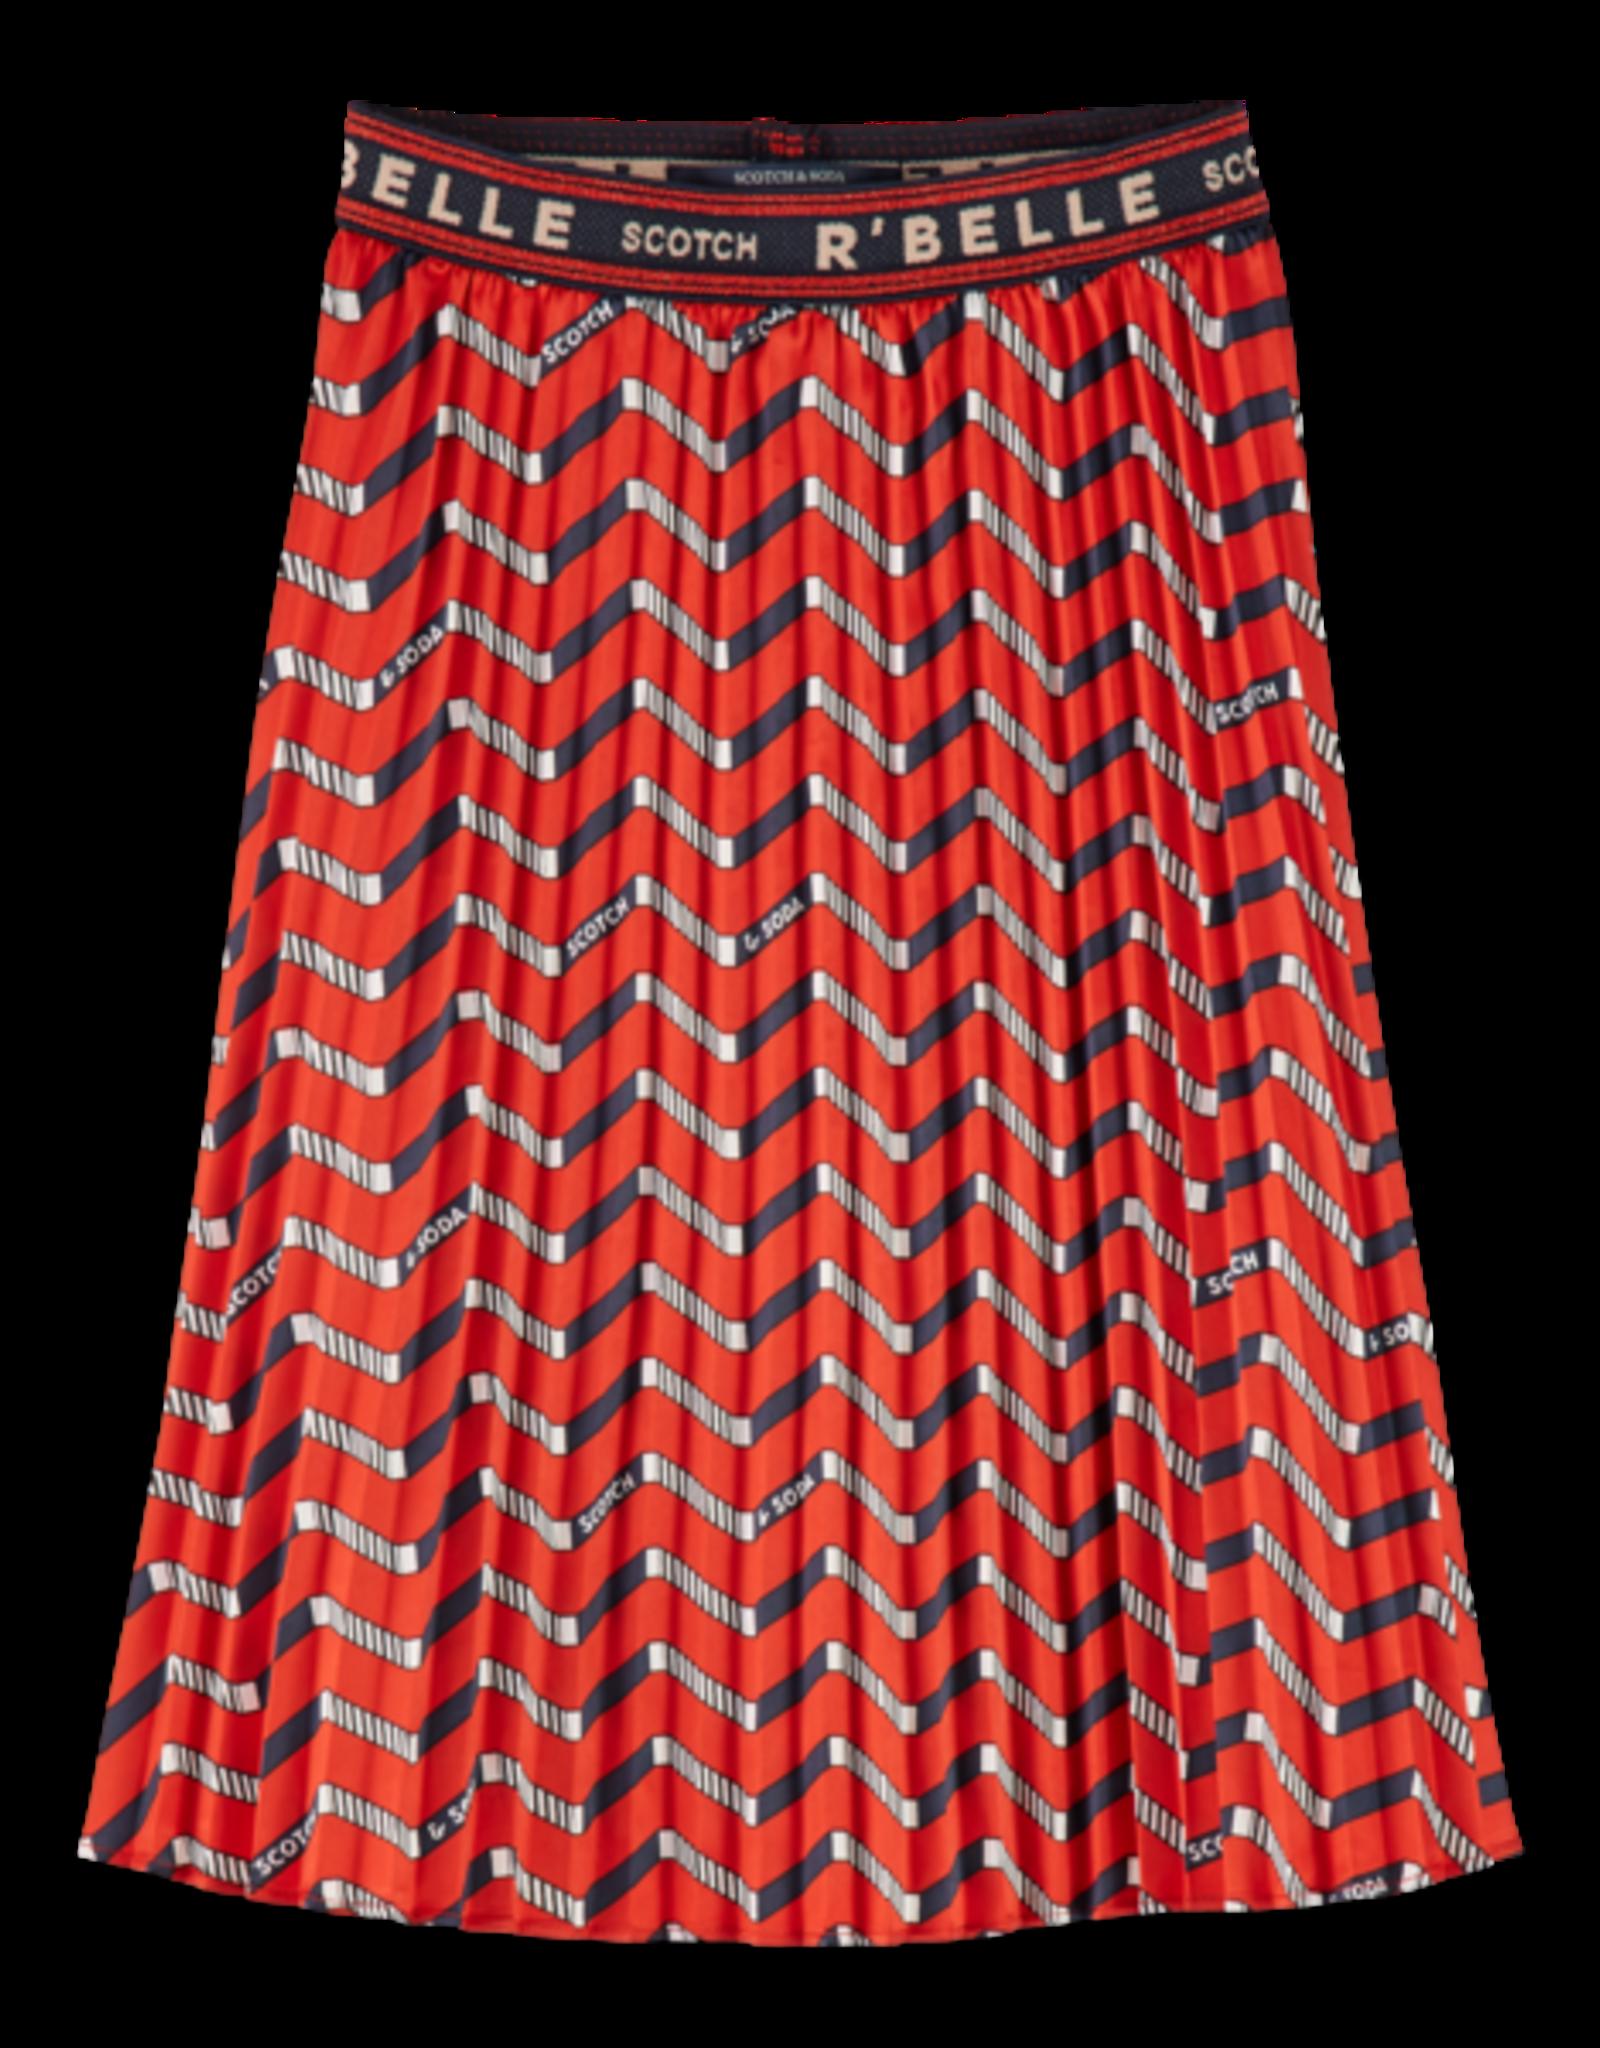 Scotch R'Belle Scotch R'Belle plissérokje met zigzag allover print